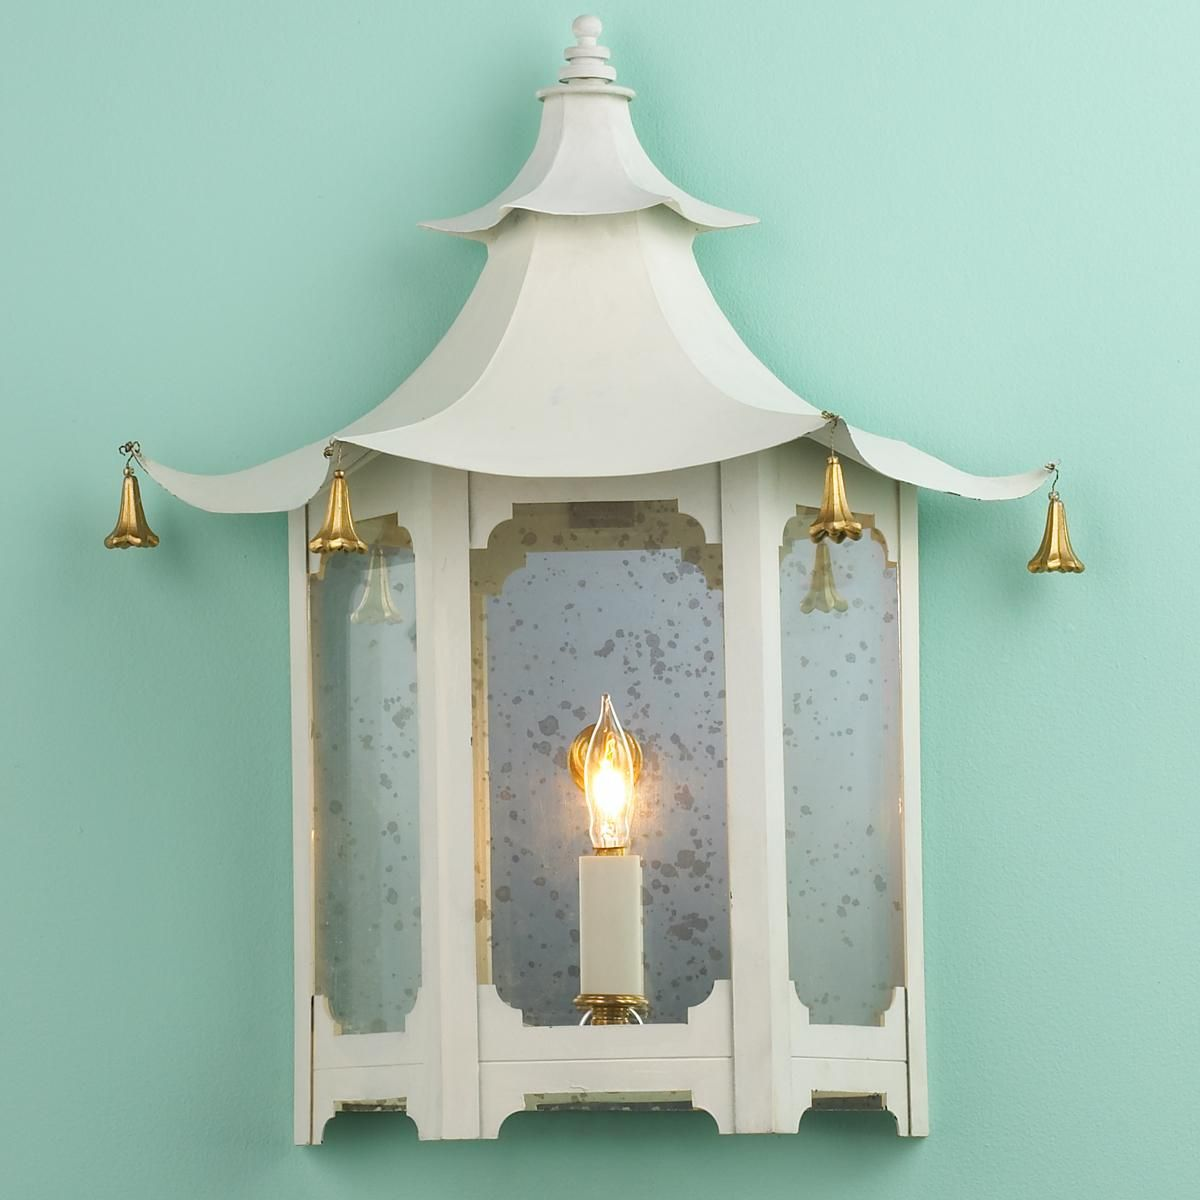 Bathroom Sconce Inspiration Shades Of Light Vintage Pagoda Sconce Office Pinterest